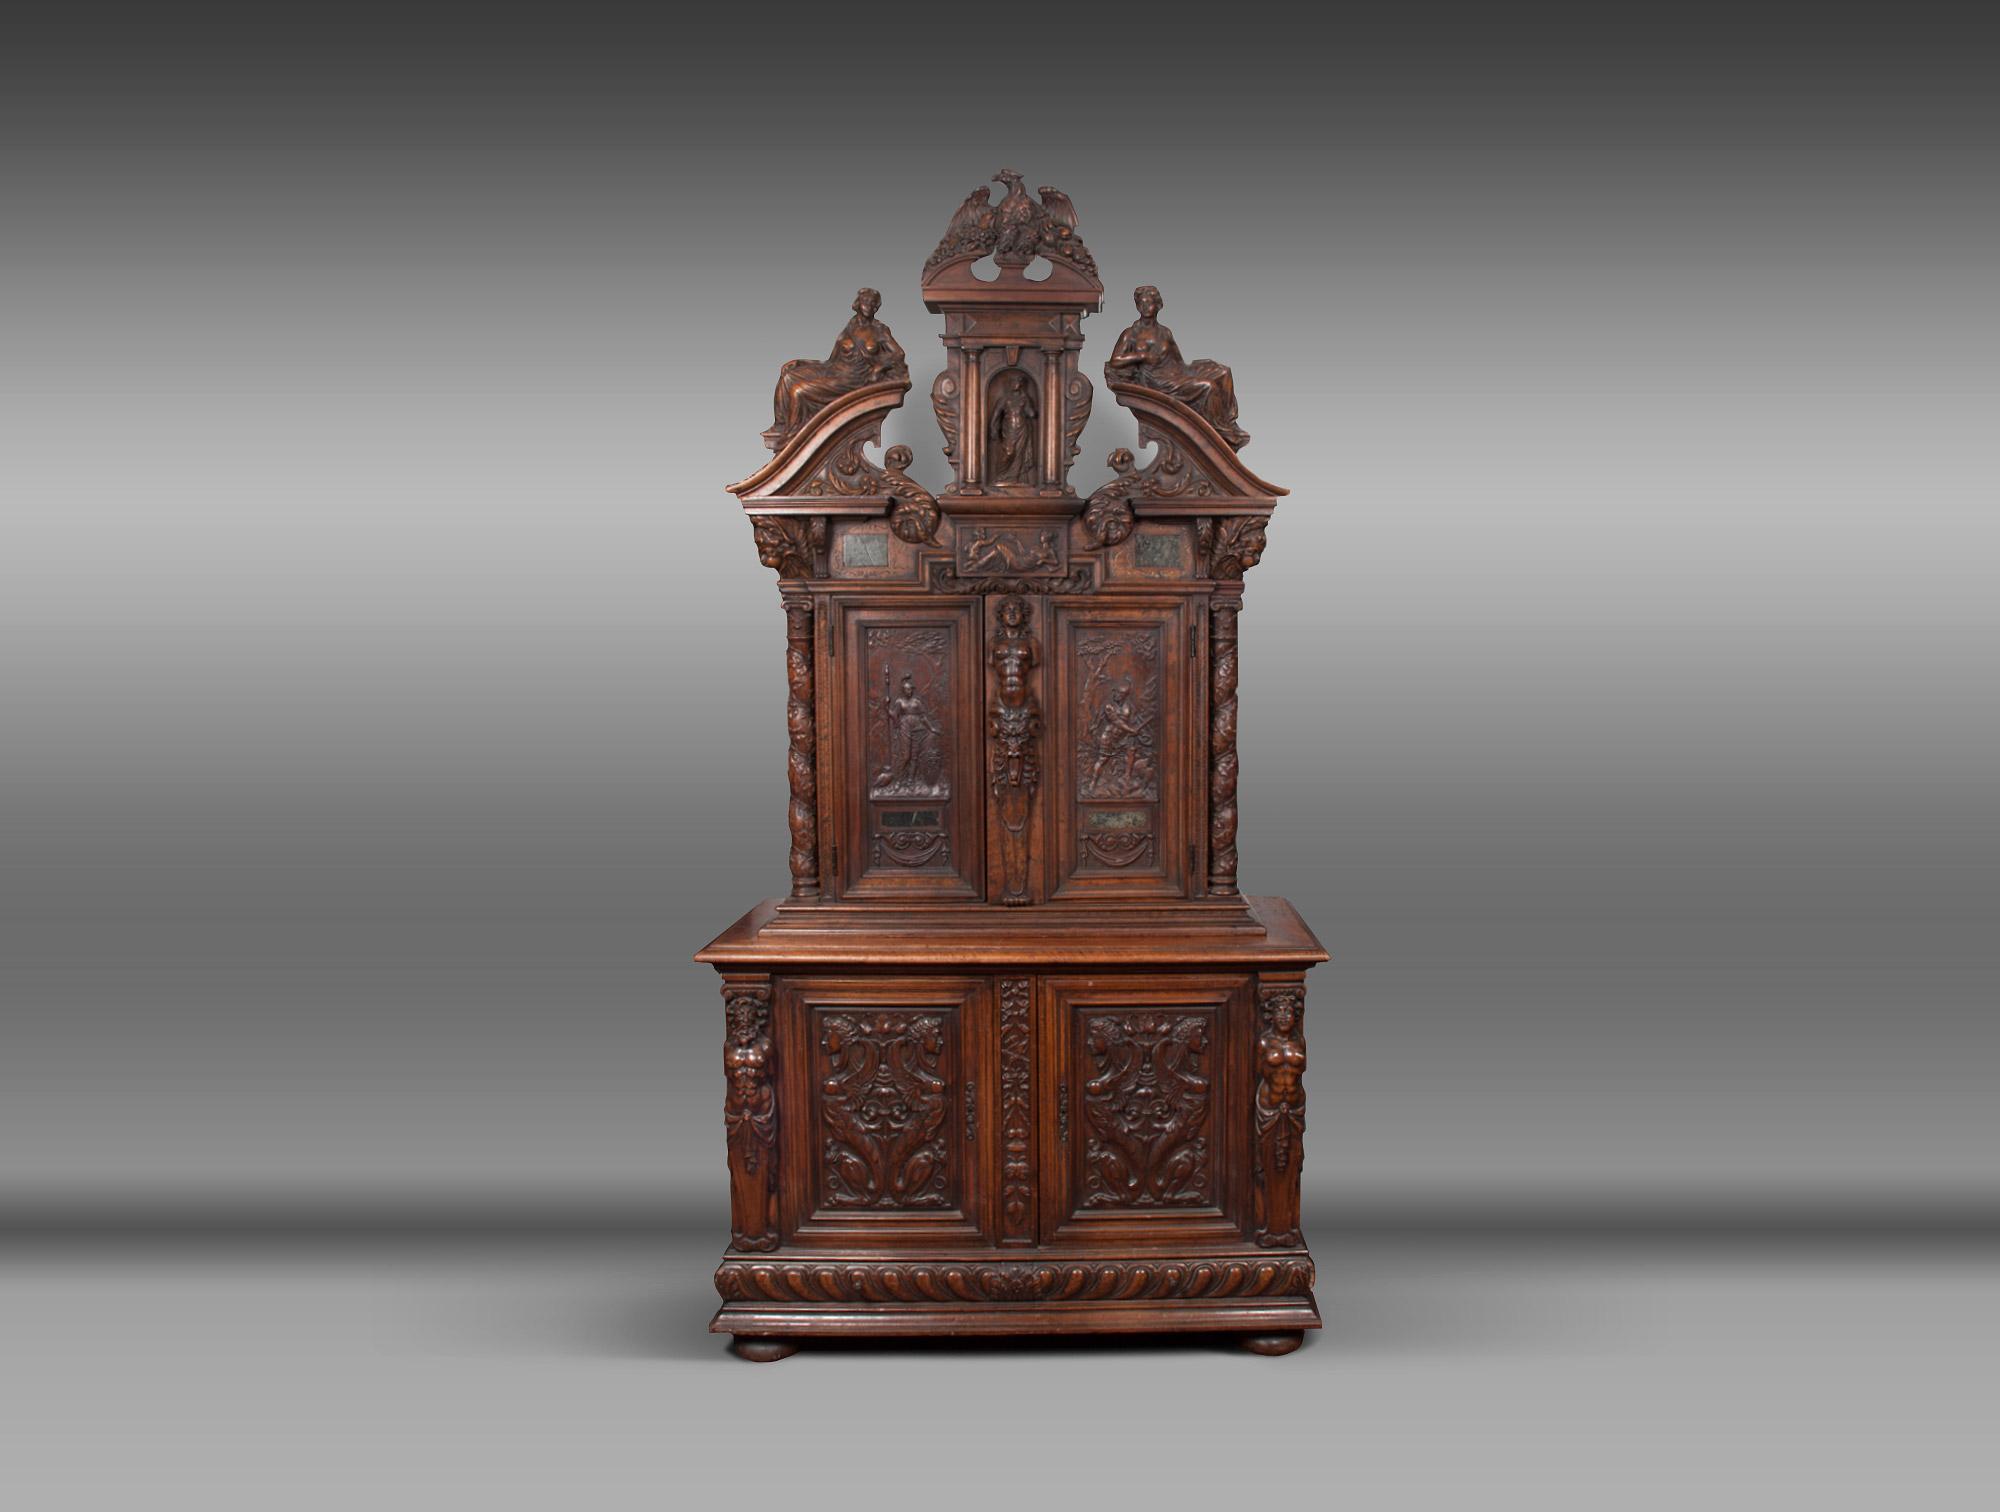 buffet de style henri ii soubrier louer rangements buffet xixe. Black Bedroom Furniture Sets. Home Design Ideas